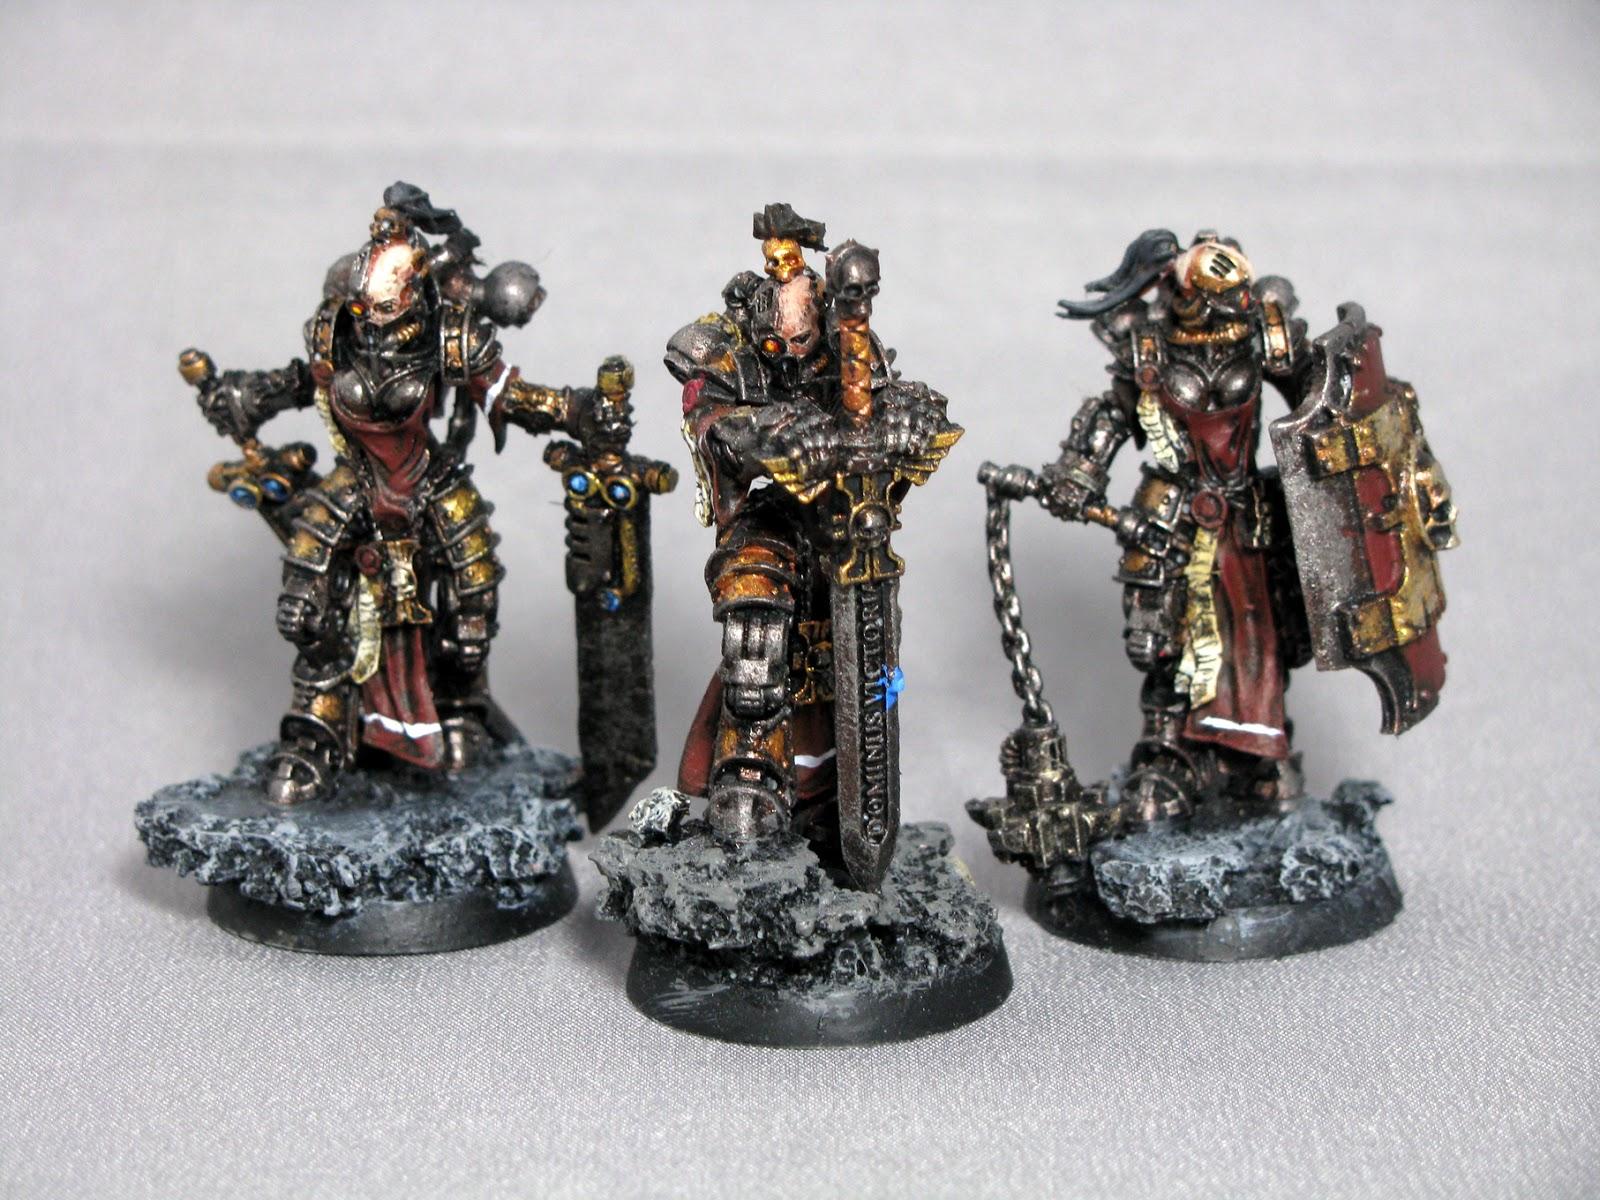 Musings of a Metal Mind: Heresy Hunter Dominators